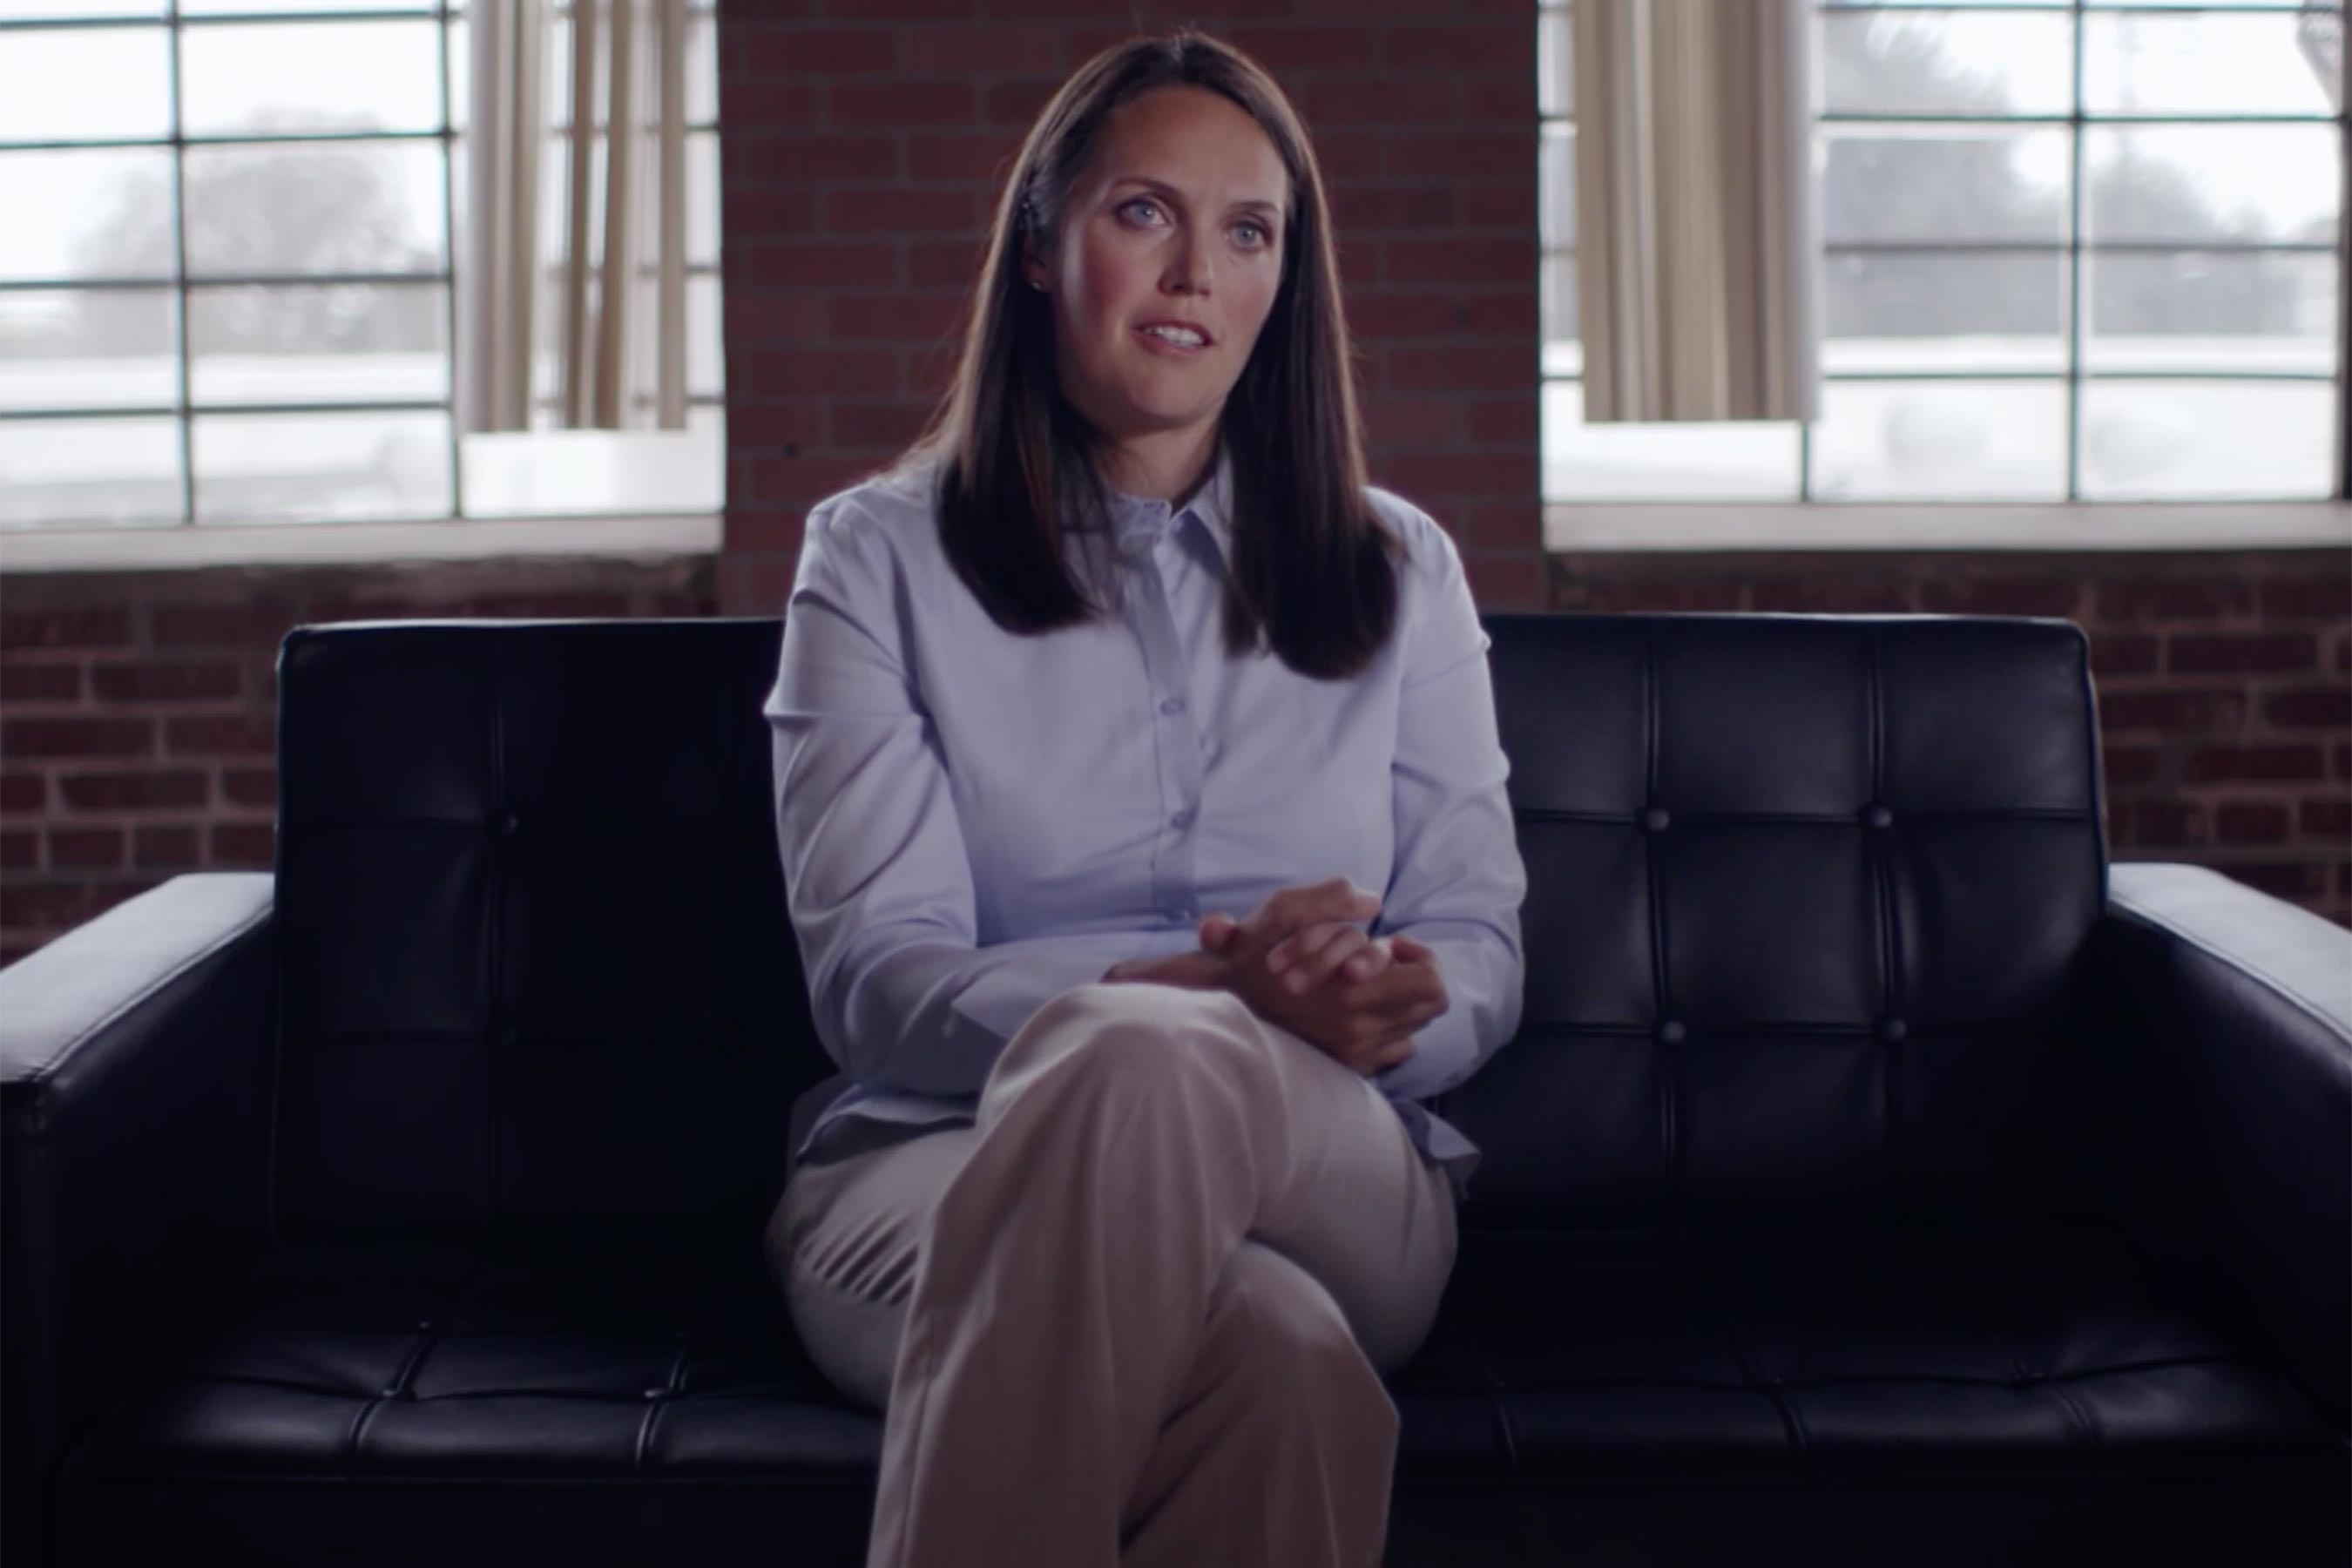 detective-julia-bowman-2